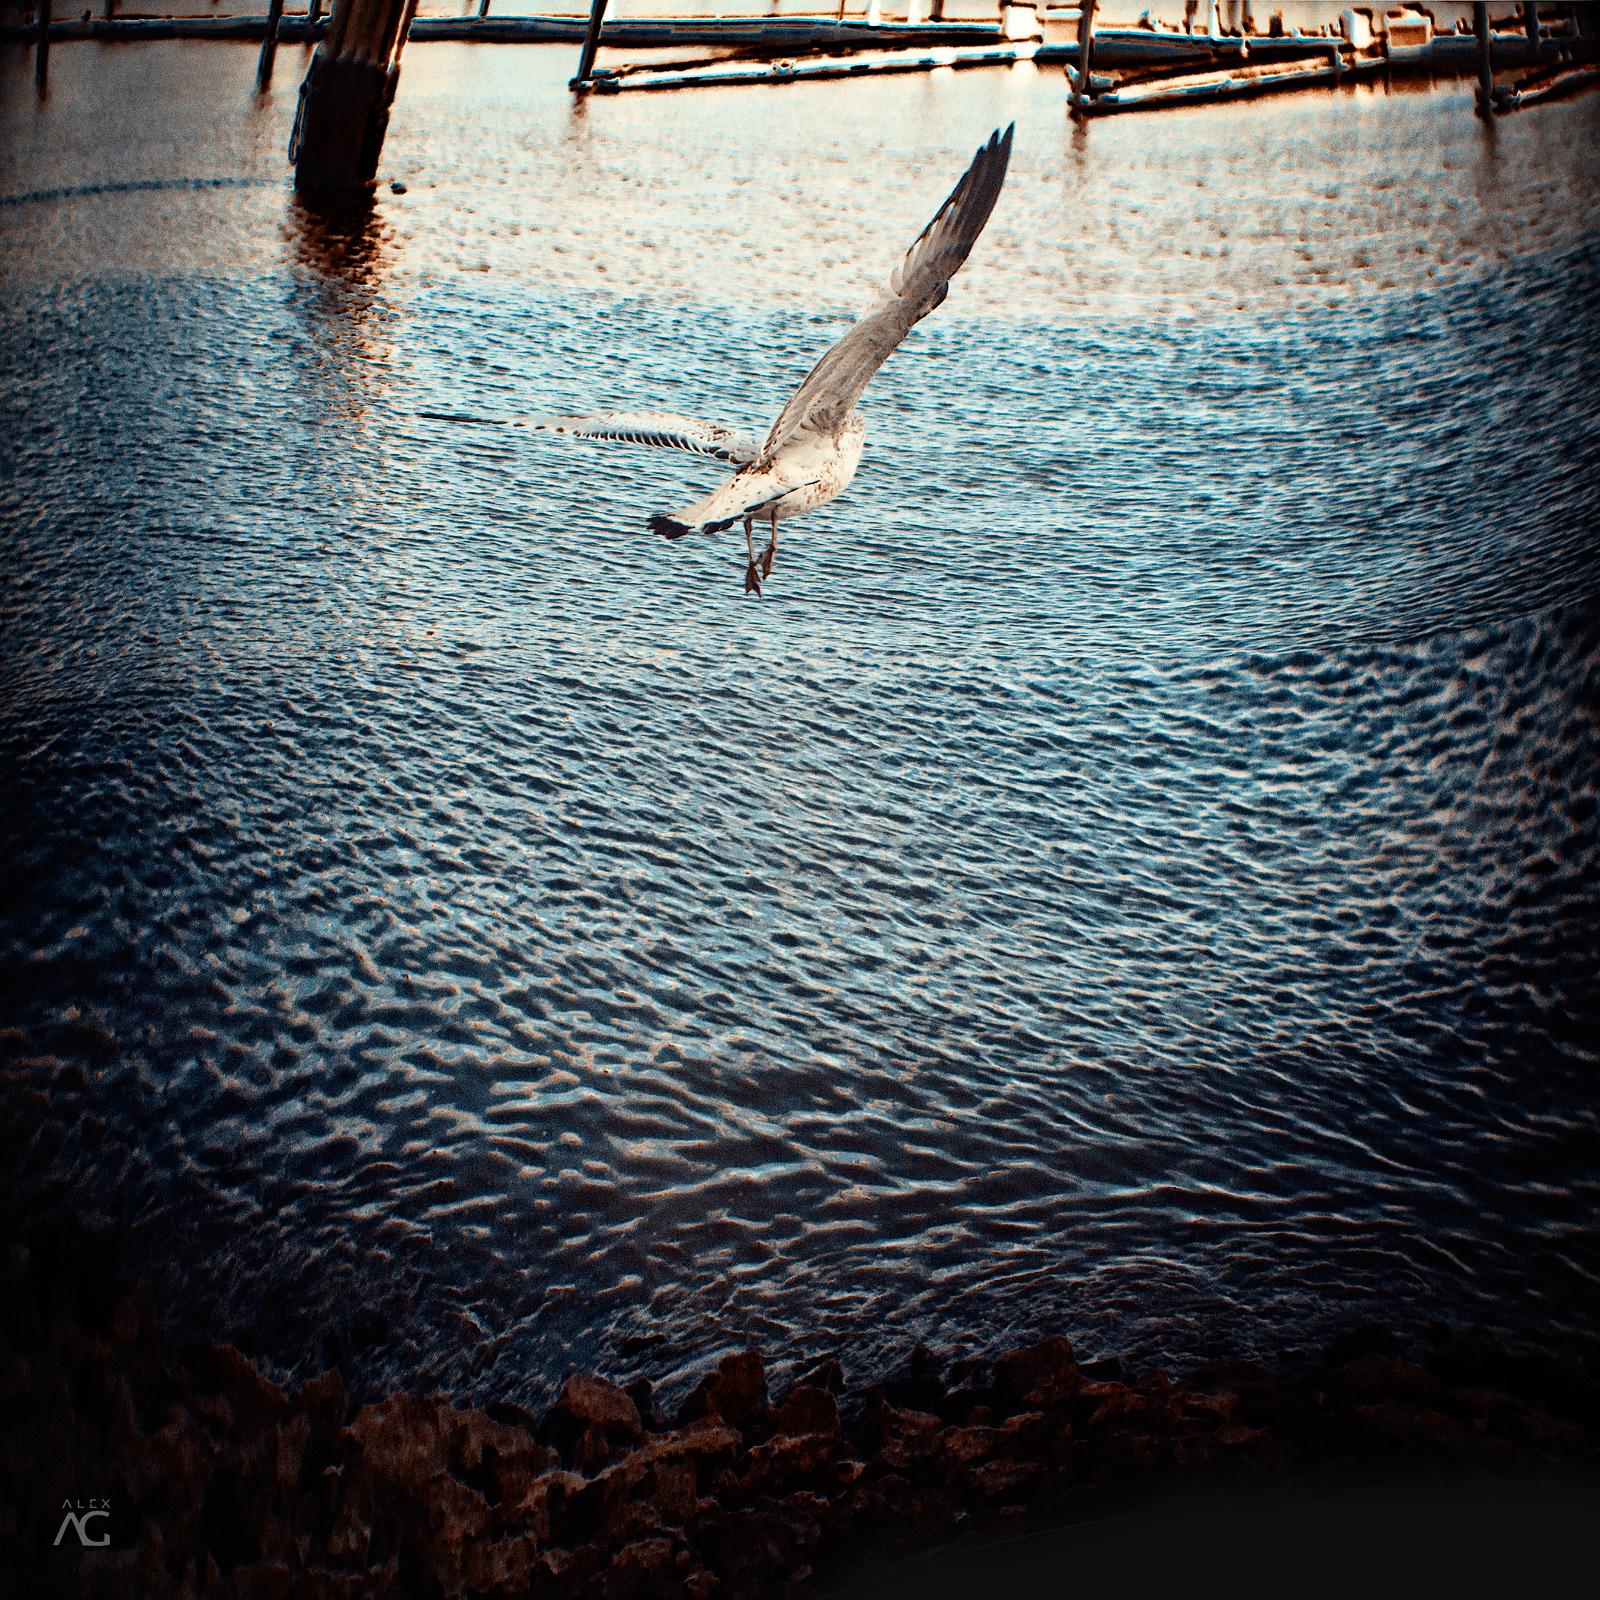 SeagullFlyingOverHudsonSingleShot_Romanika_MG_5120_1600